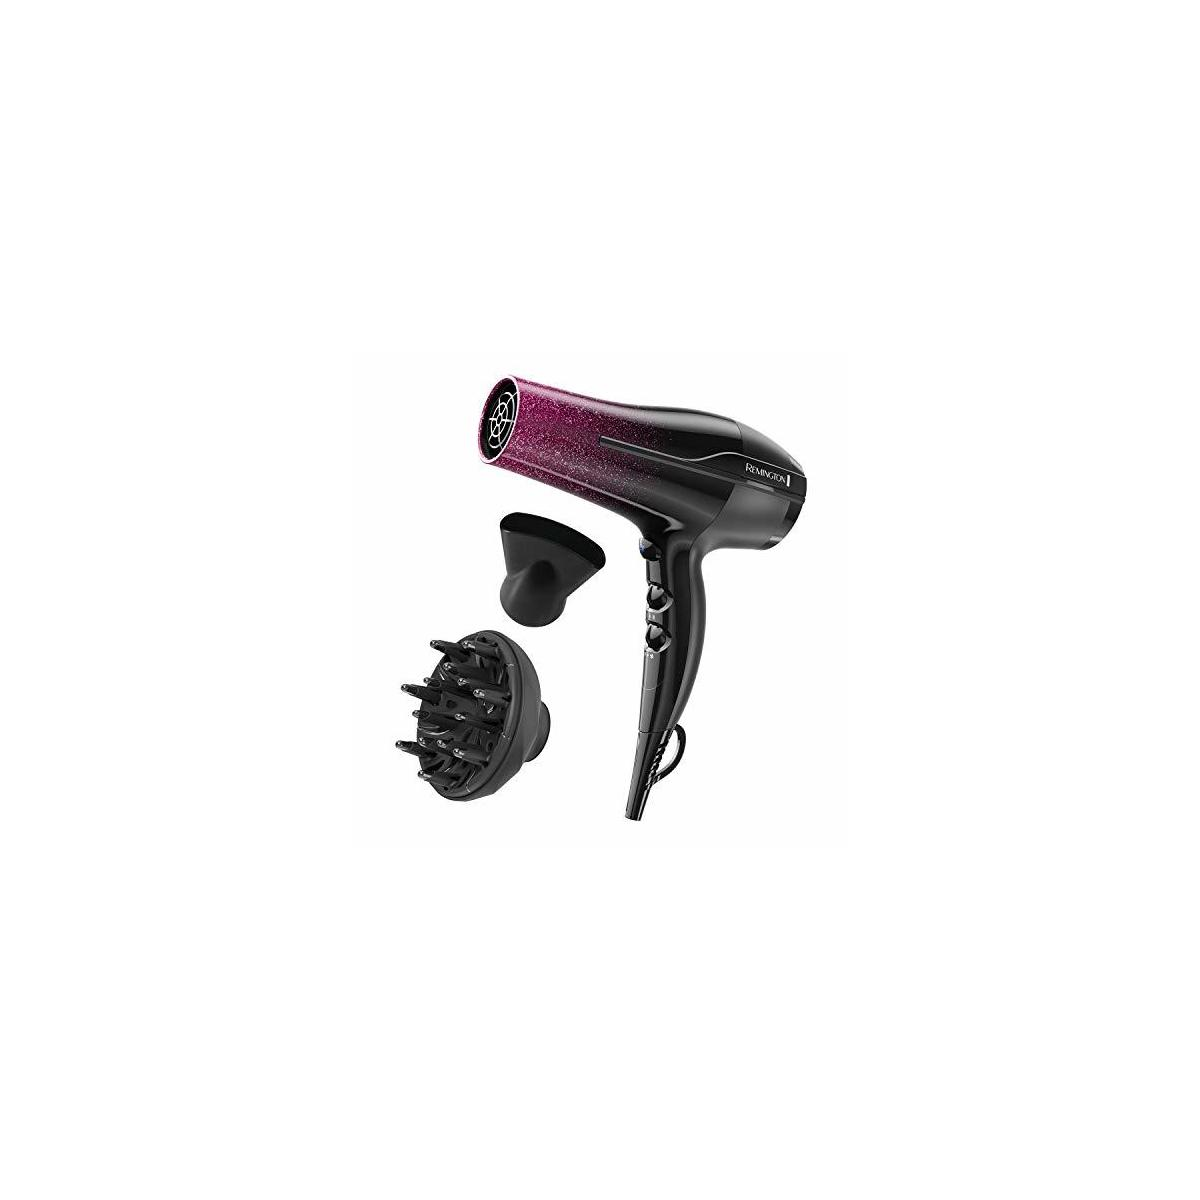 REMINGTON D5950 Ultimate Smooth Dryer, 3 Heat + 2 Speed Settings + Cool Shot, Black/Purple